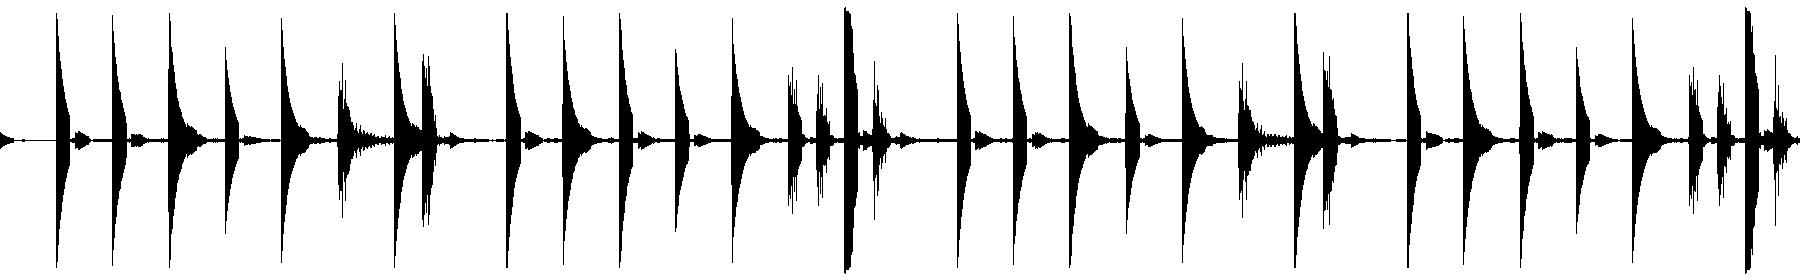 cheerfull synth 125